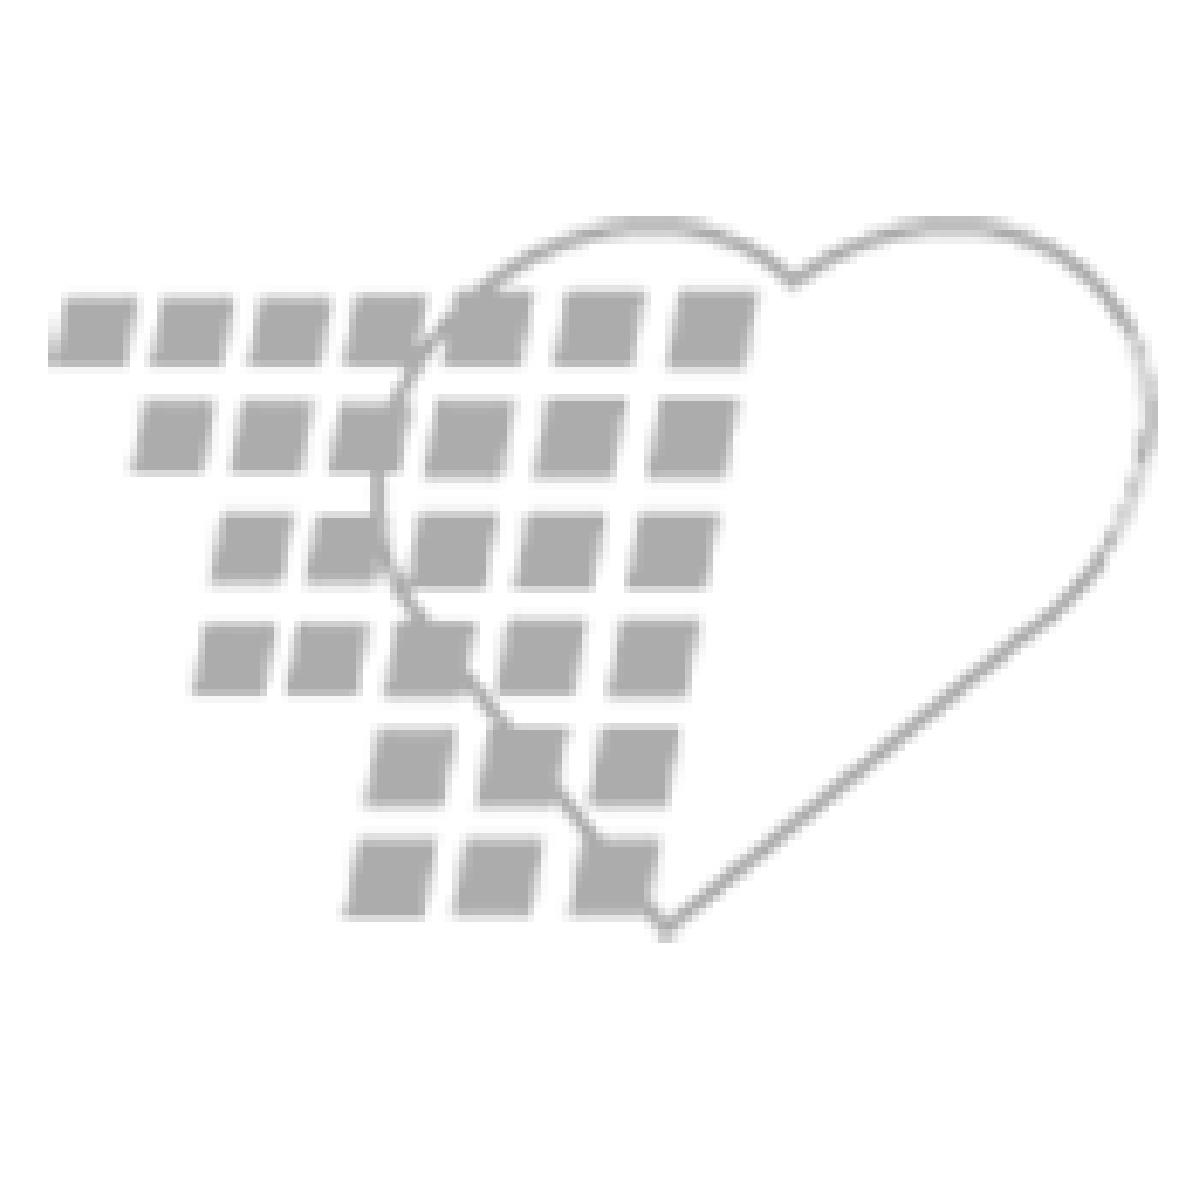 02-92-1107 - Skyndex® Skinfold Caliper Durnin Jackson-Pollock - 14 x 5 x10 Inch